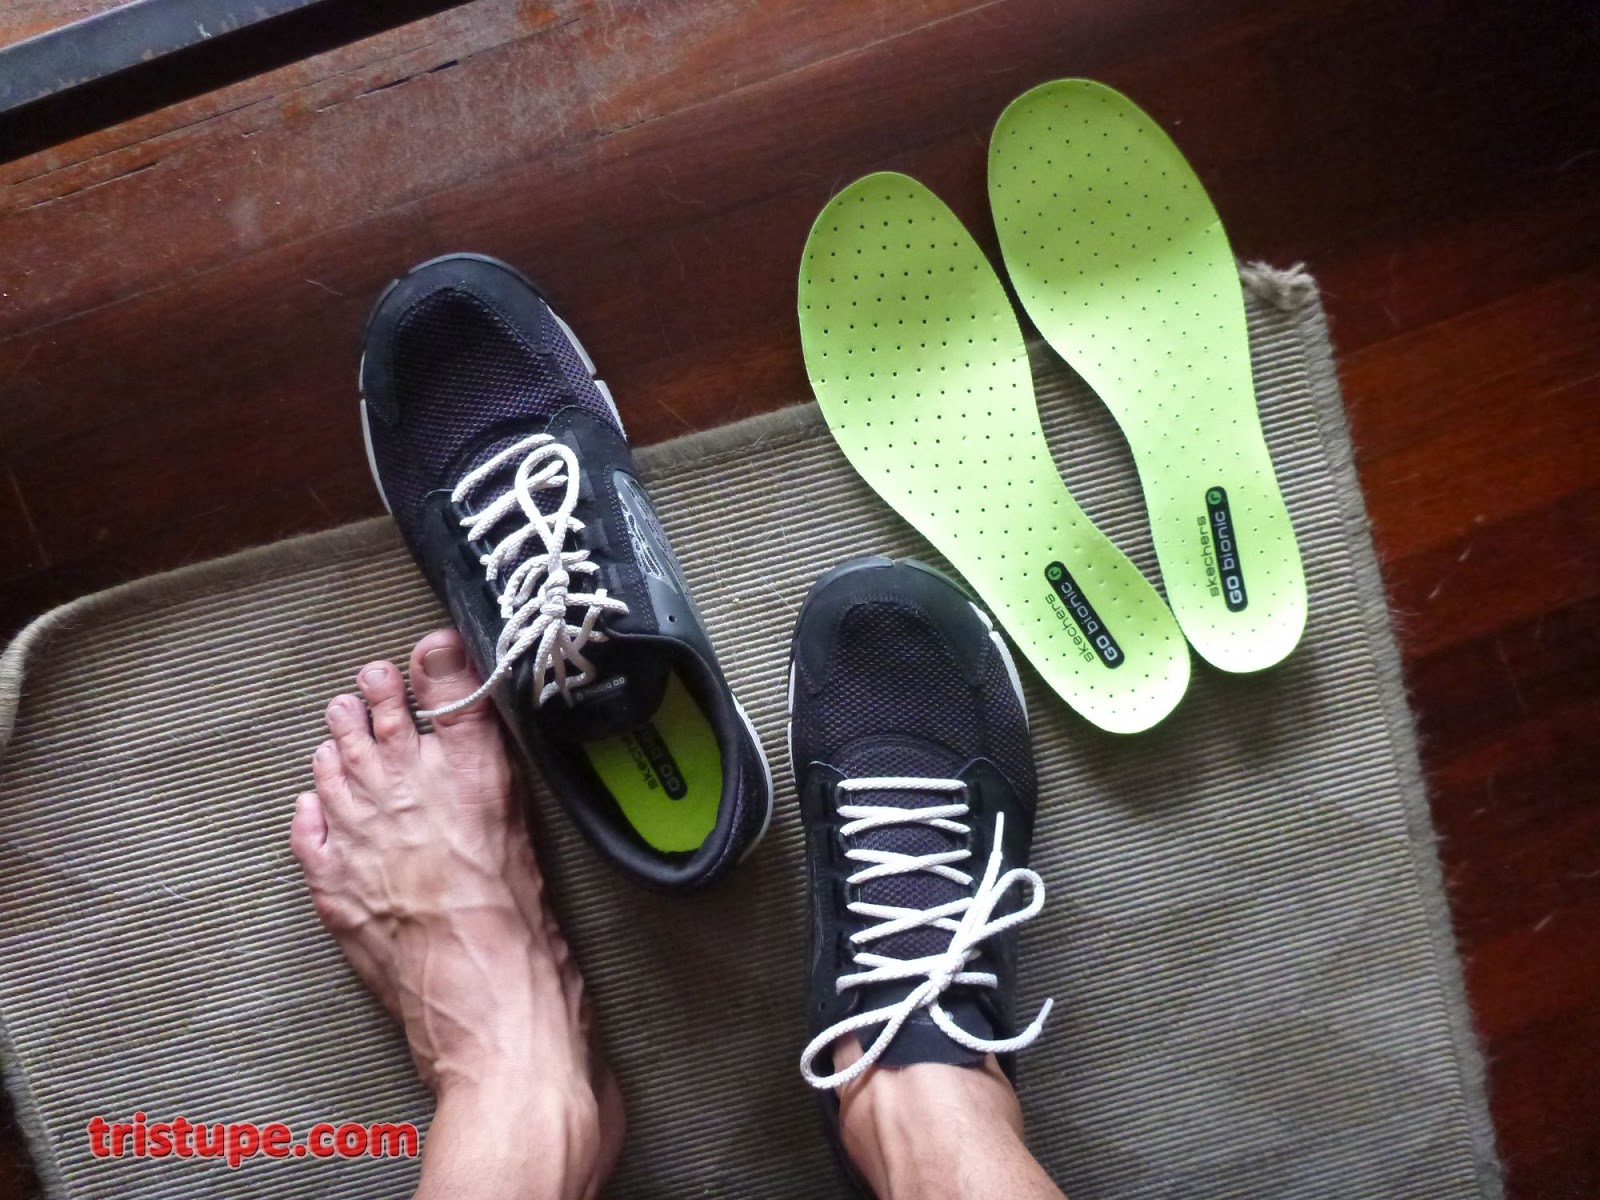 Sketchers Shoe Store Albuquerque Black Friday